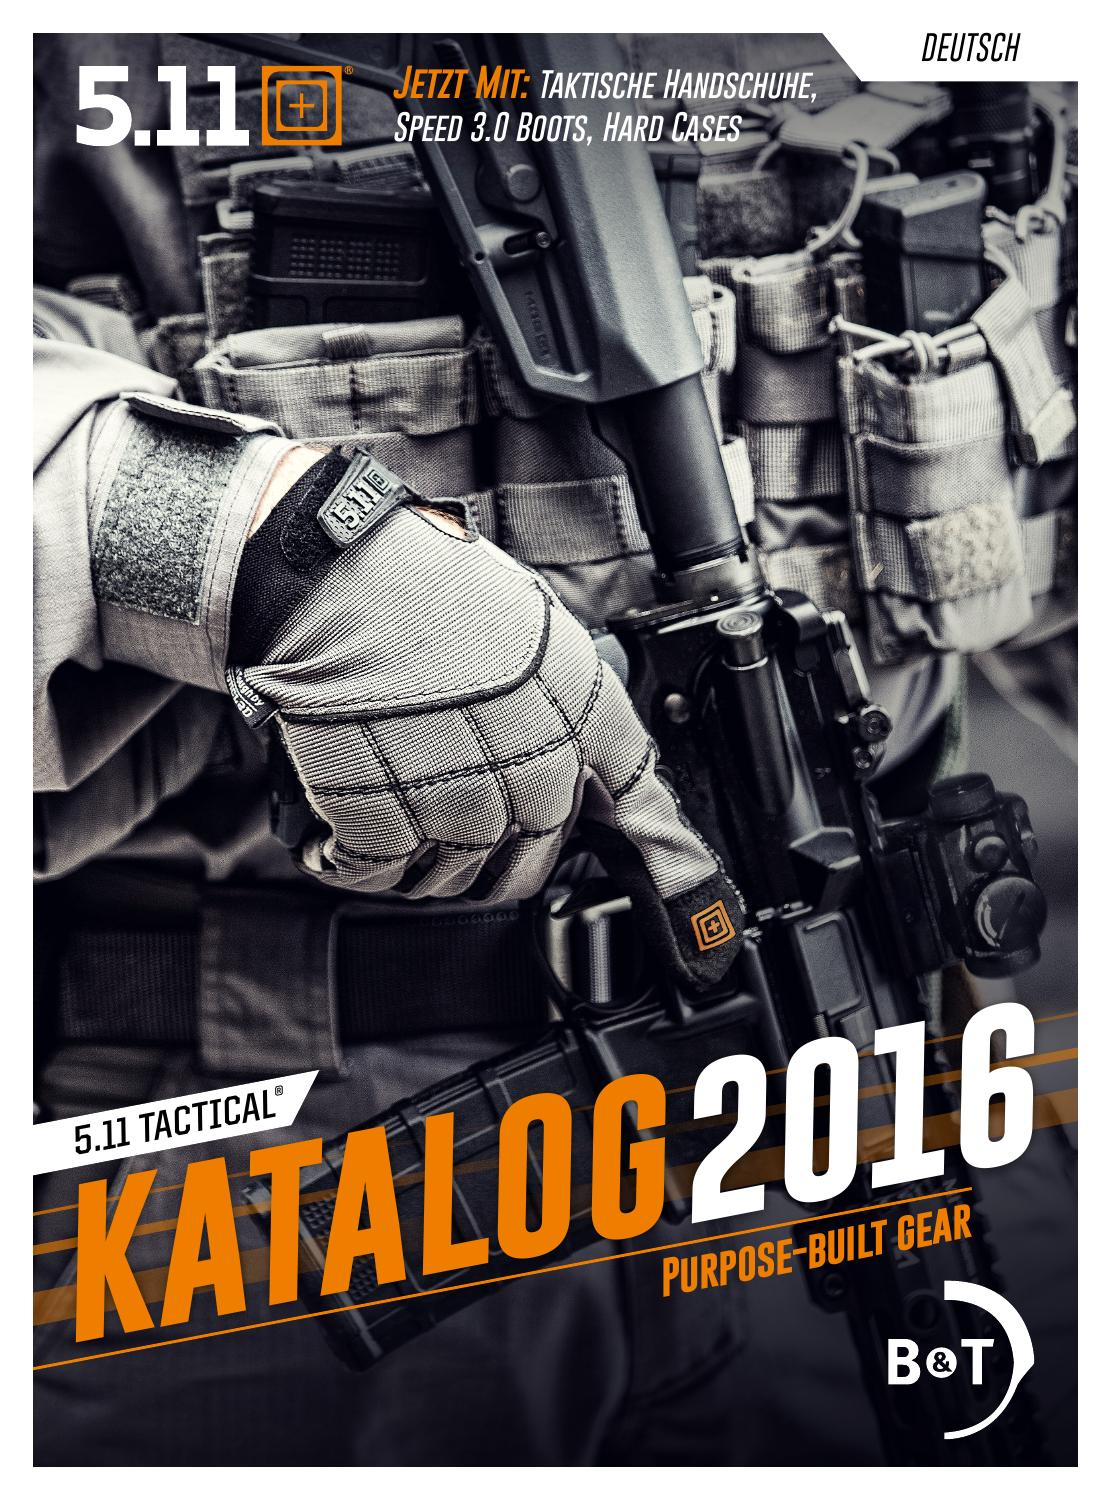 Tactical Survival Erste-Hilfe-Kit-Tasche Herausnehmbare EMT-Tasche Medical Pouch